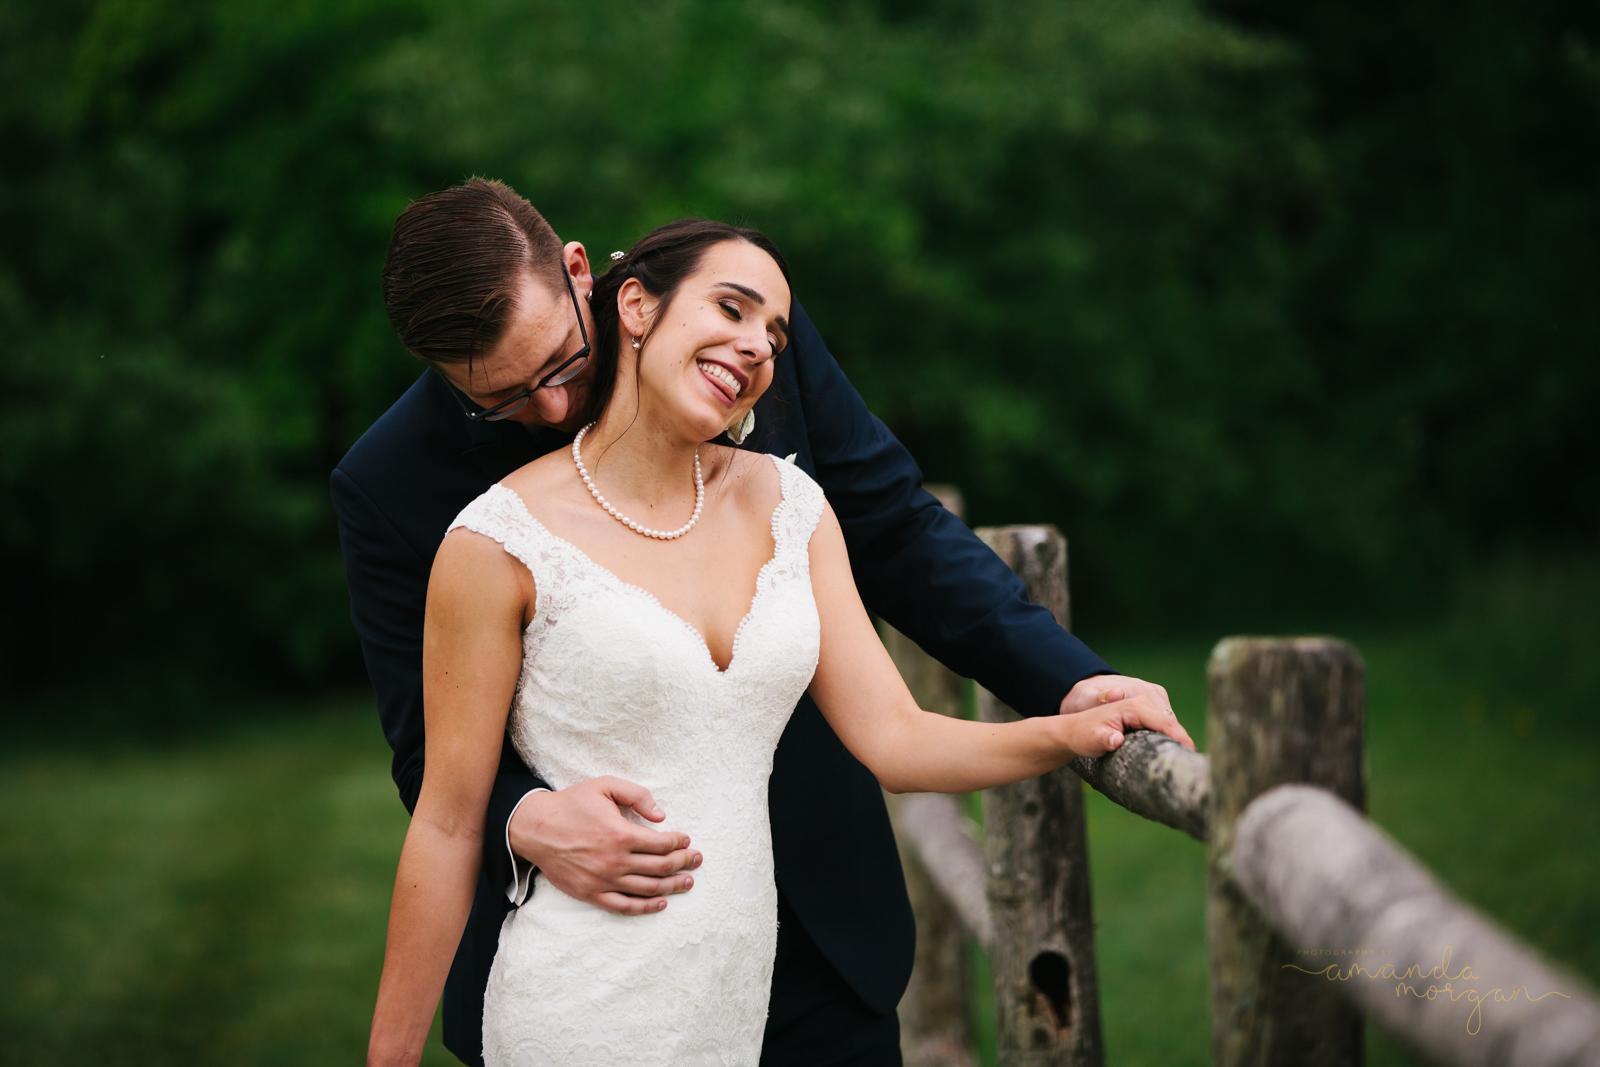 Publick-House-Wedding-Amanda-Morgan-39.jpg